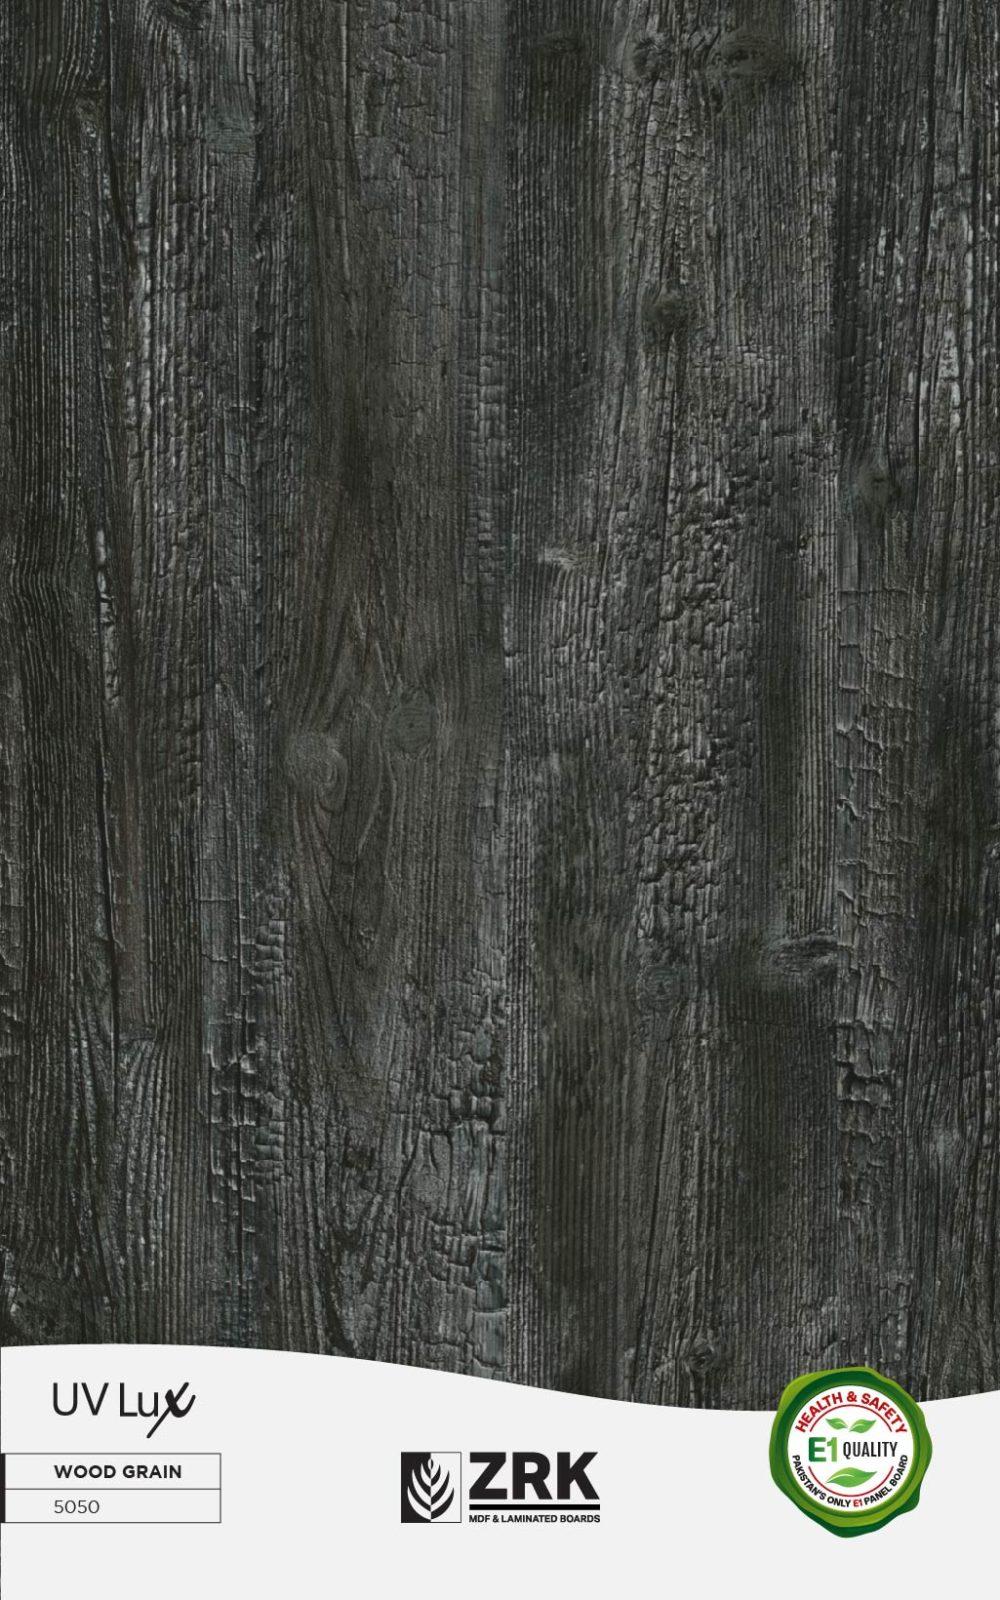 UV LUX - Wood Grain - 5050